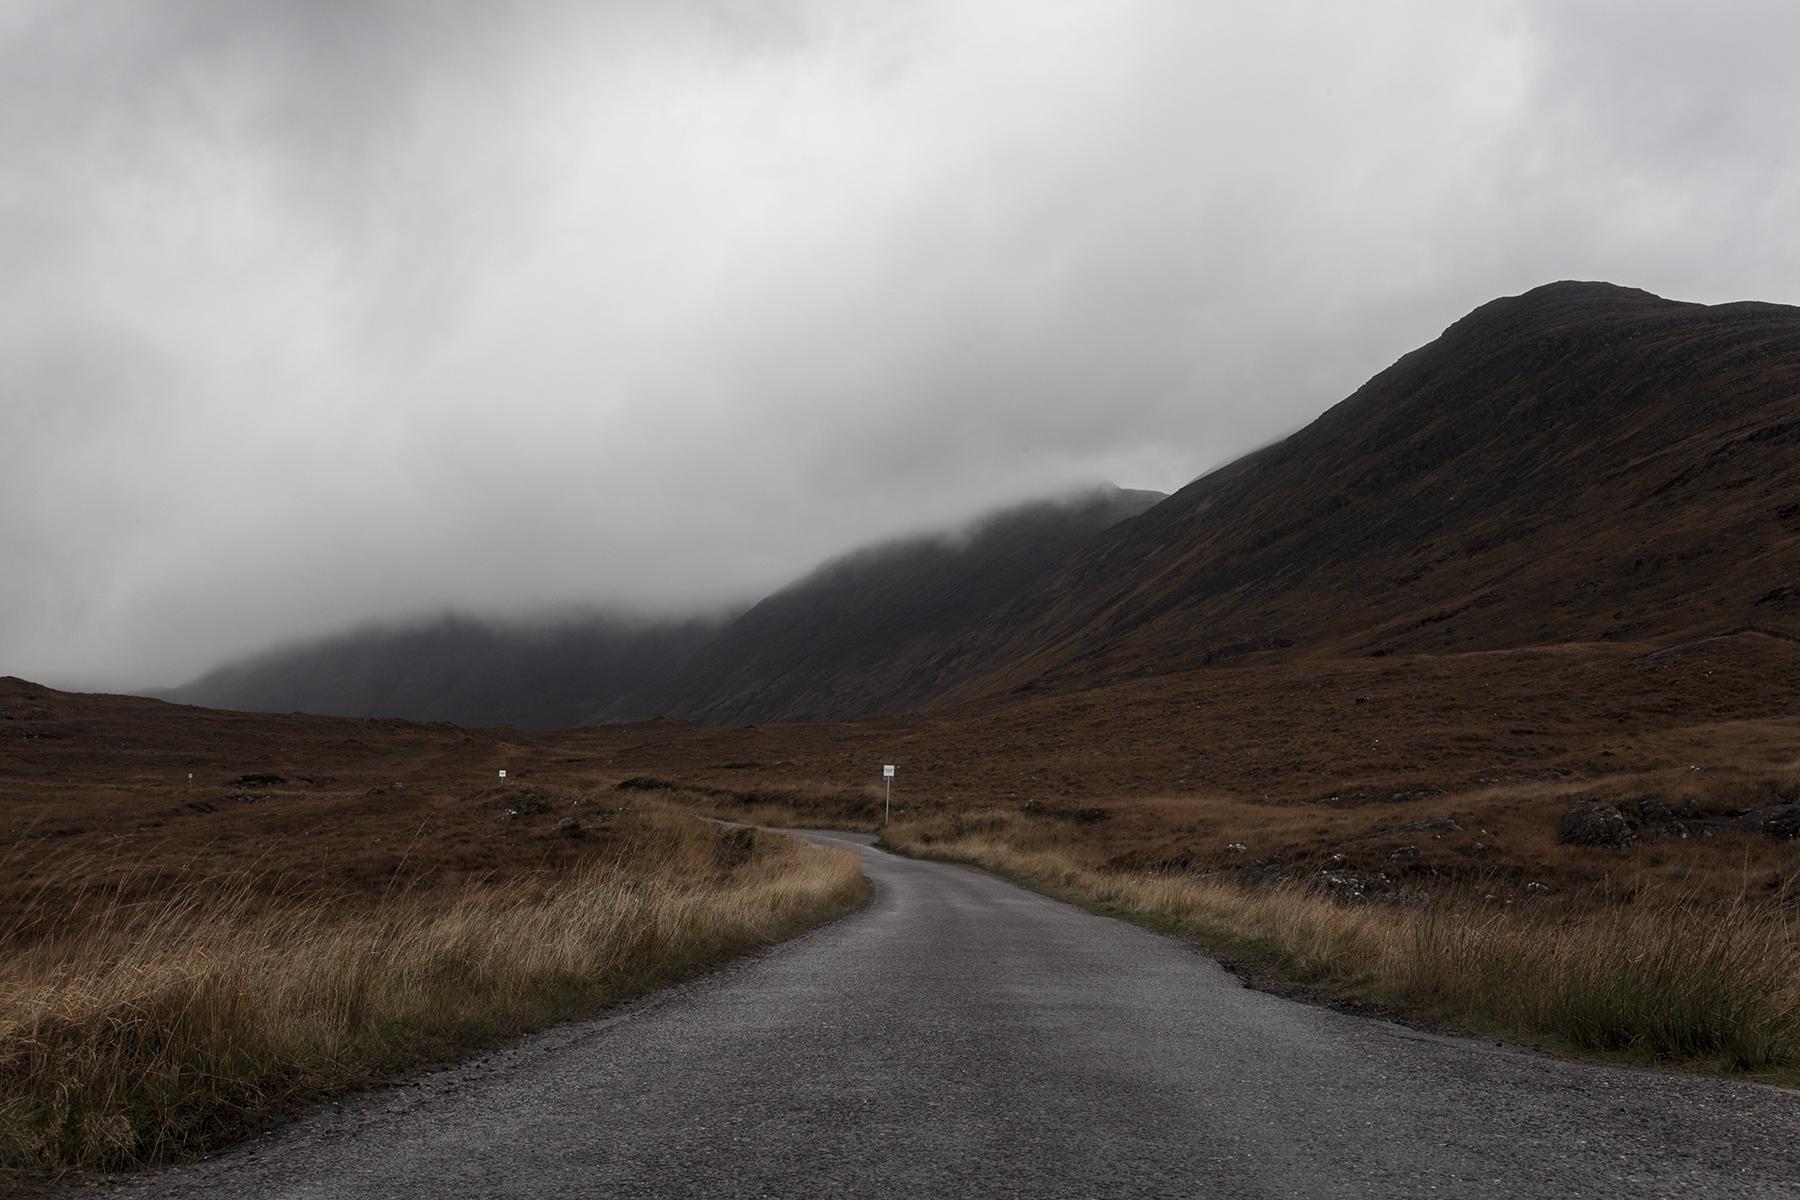 north-coast-500-scotland-22.jpg